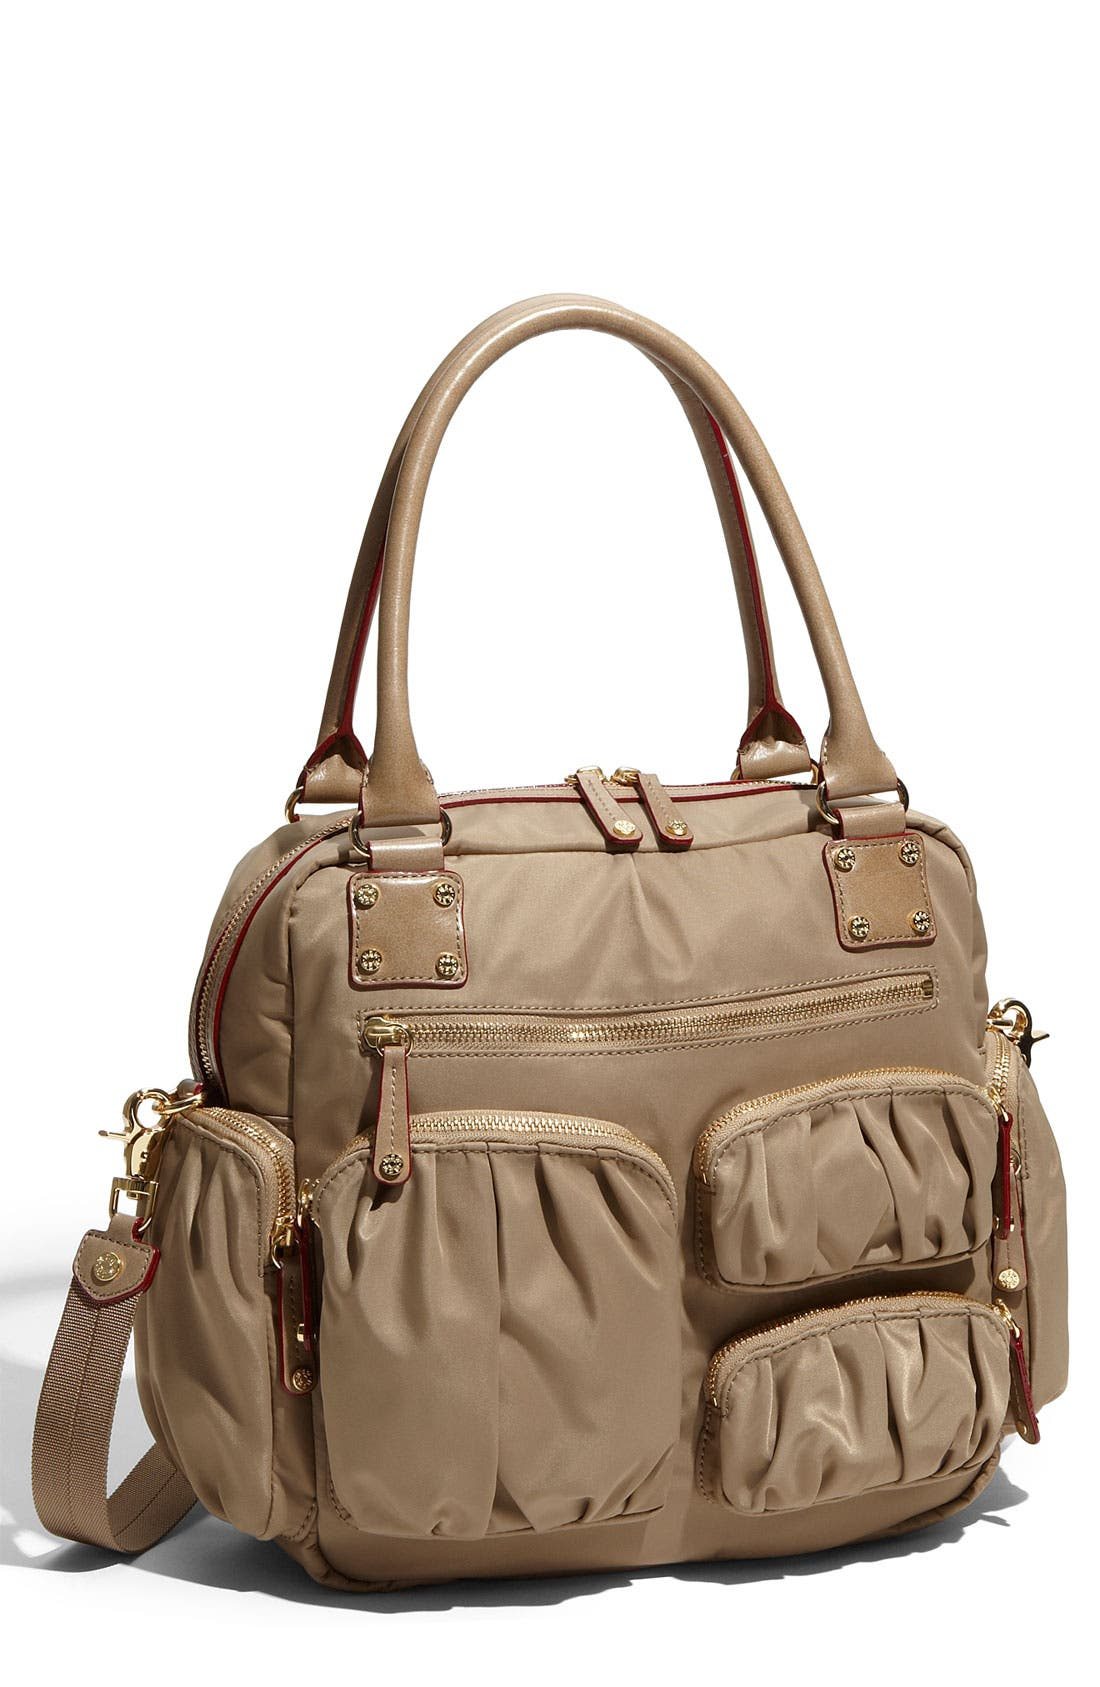 Alternate Image 1 Selected - MZ Wallace 'Frankie' Handbag